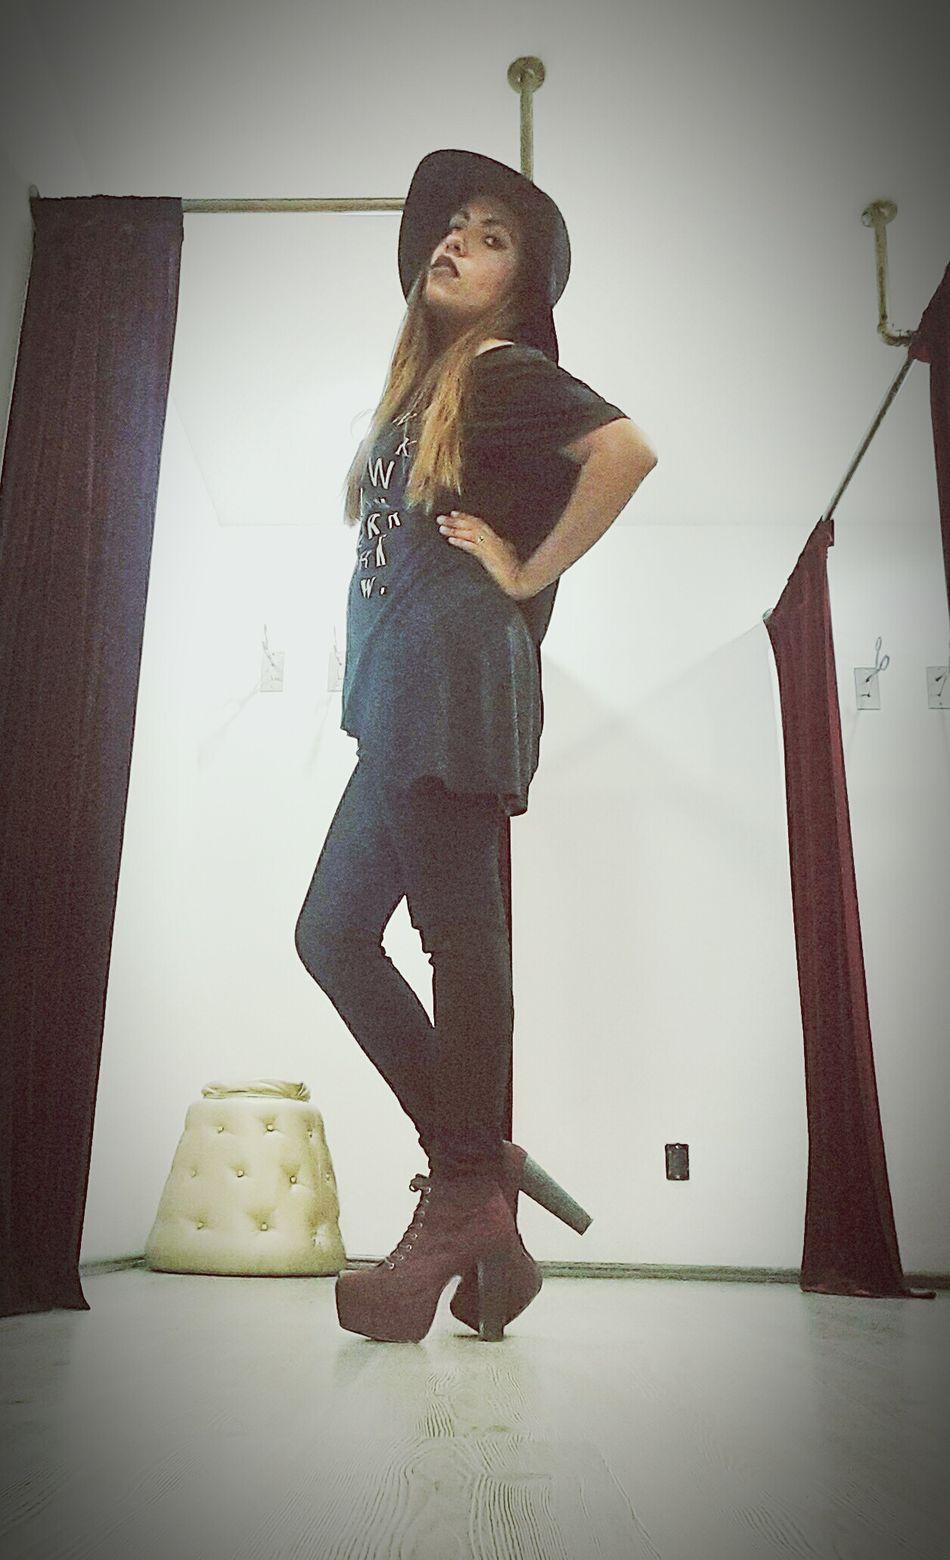 Cutie Heels Designerslife Fashion Style And Fashion Confidence  Sexygirl Hottie Beauty Fashionjob Stylish Attitude